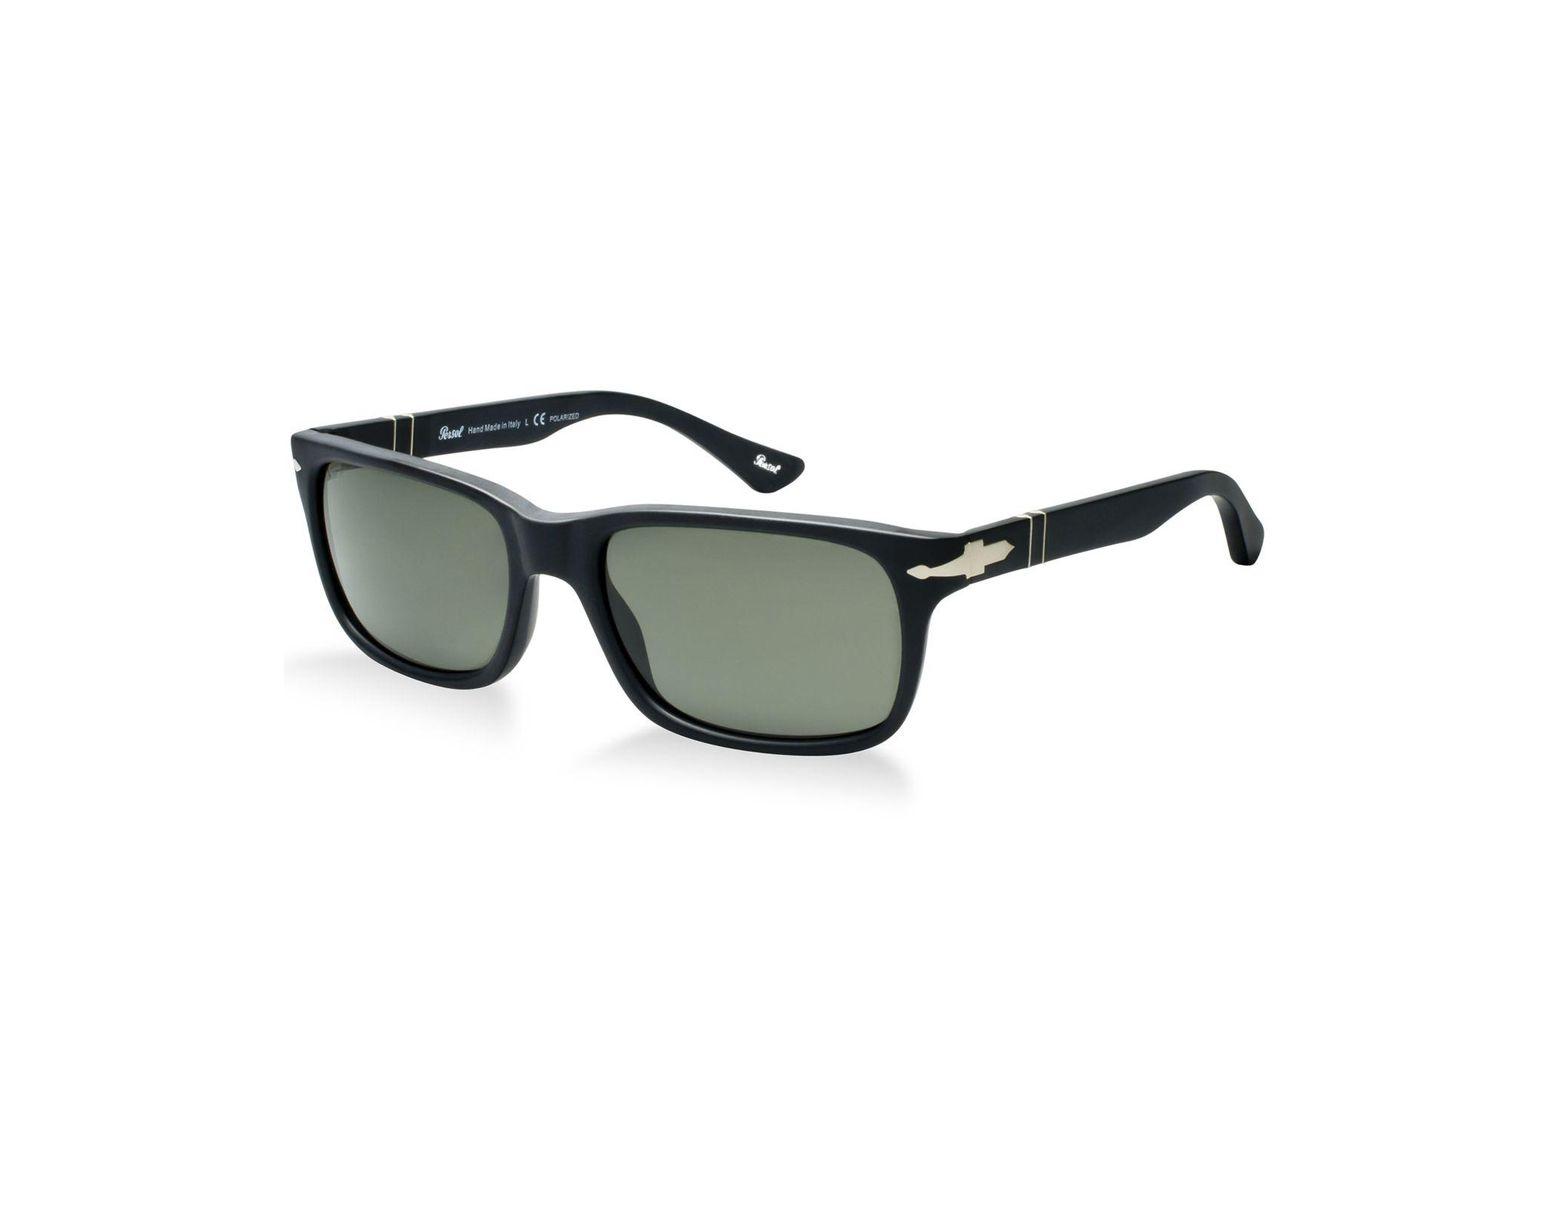 2051754335aa8 Persol Polarized Sunglasses